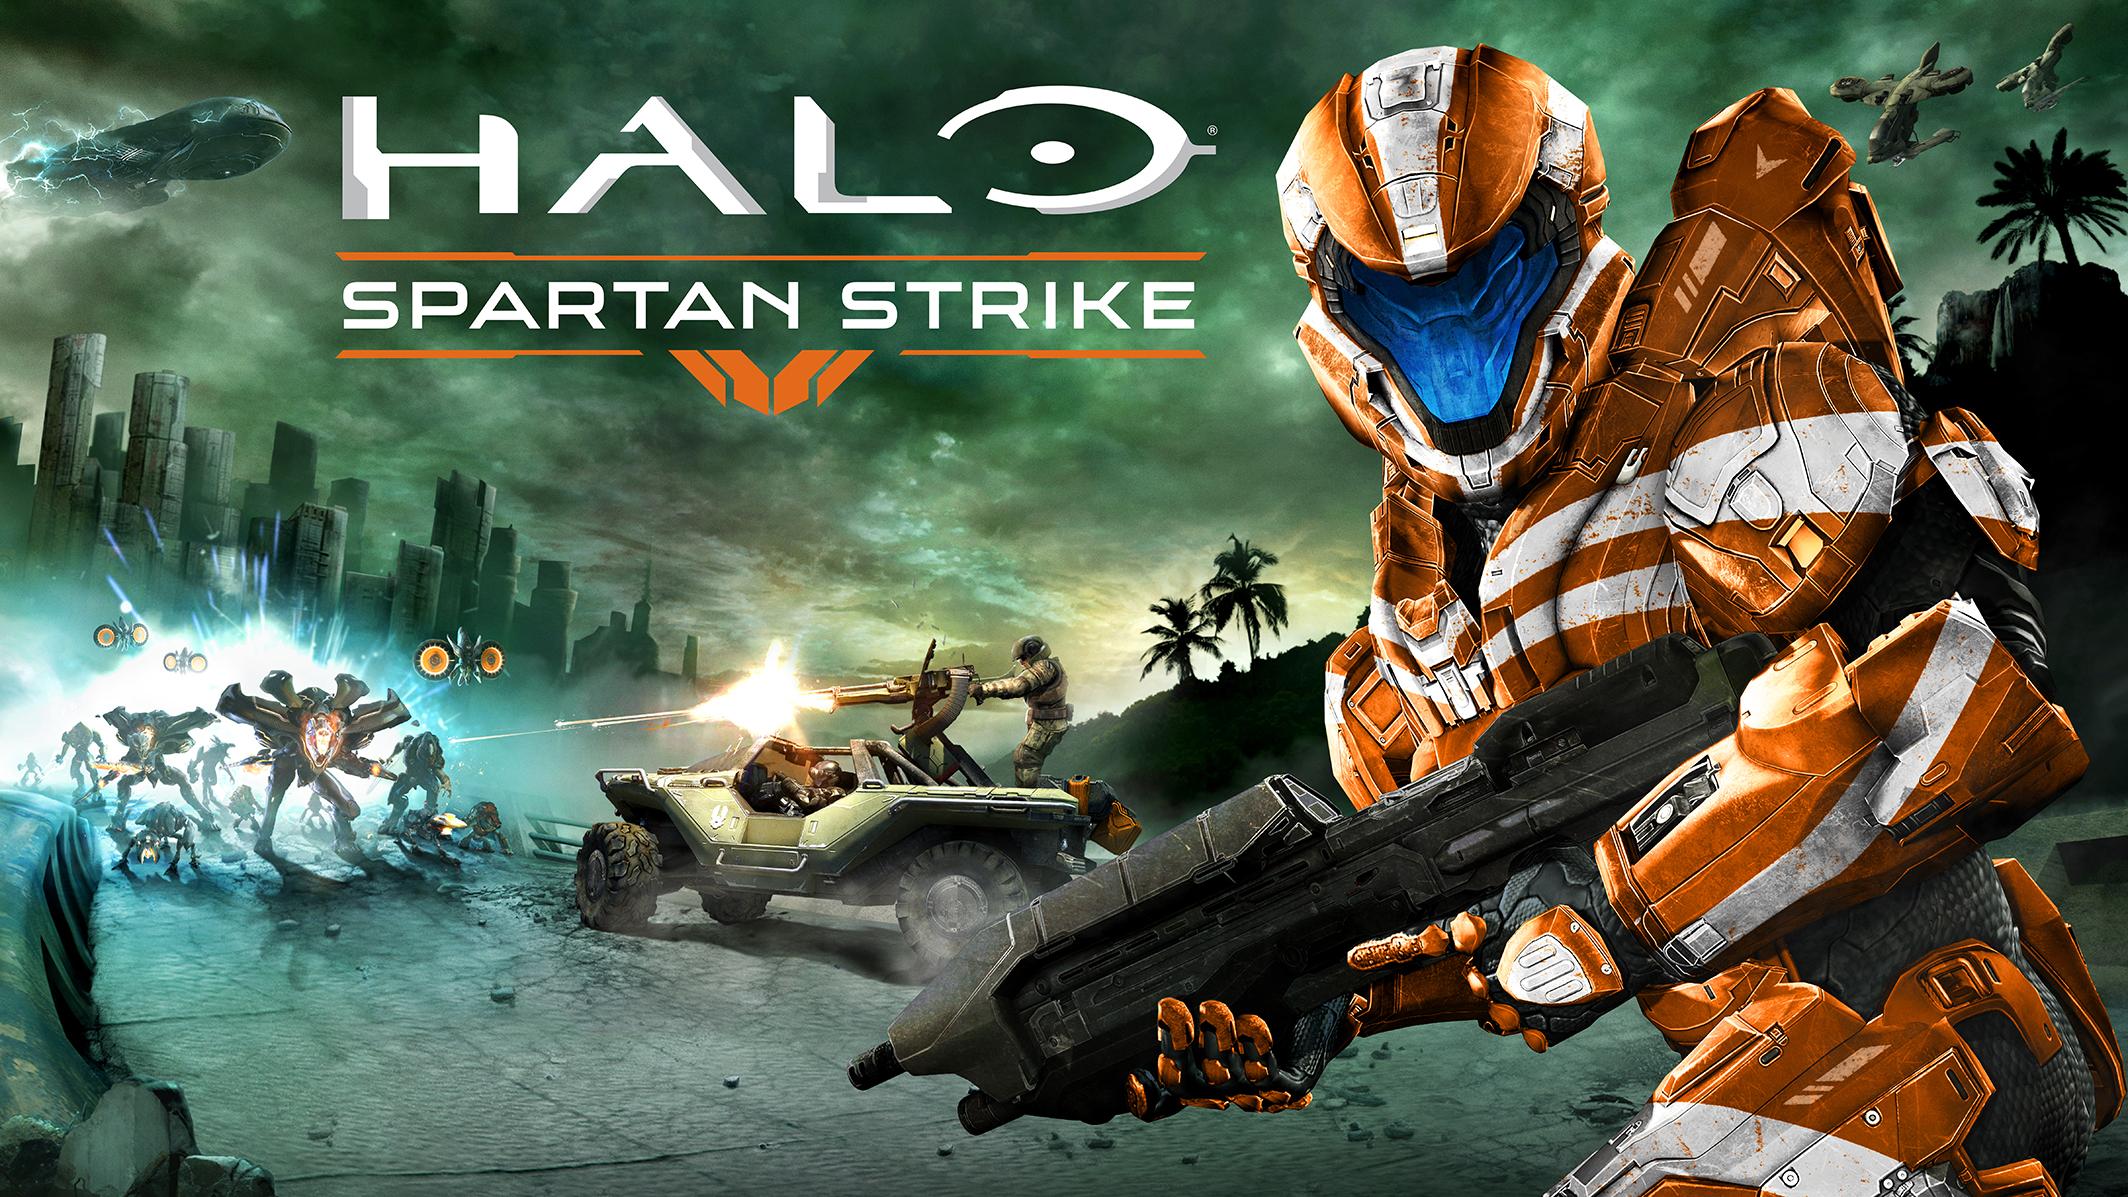 Halo_SpartanStrike_KeyArt_Horizontal_RGB_Final.jpg